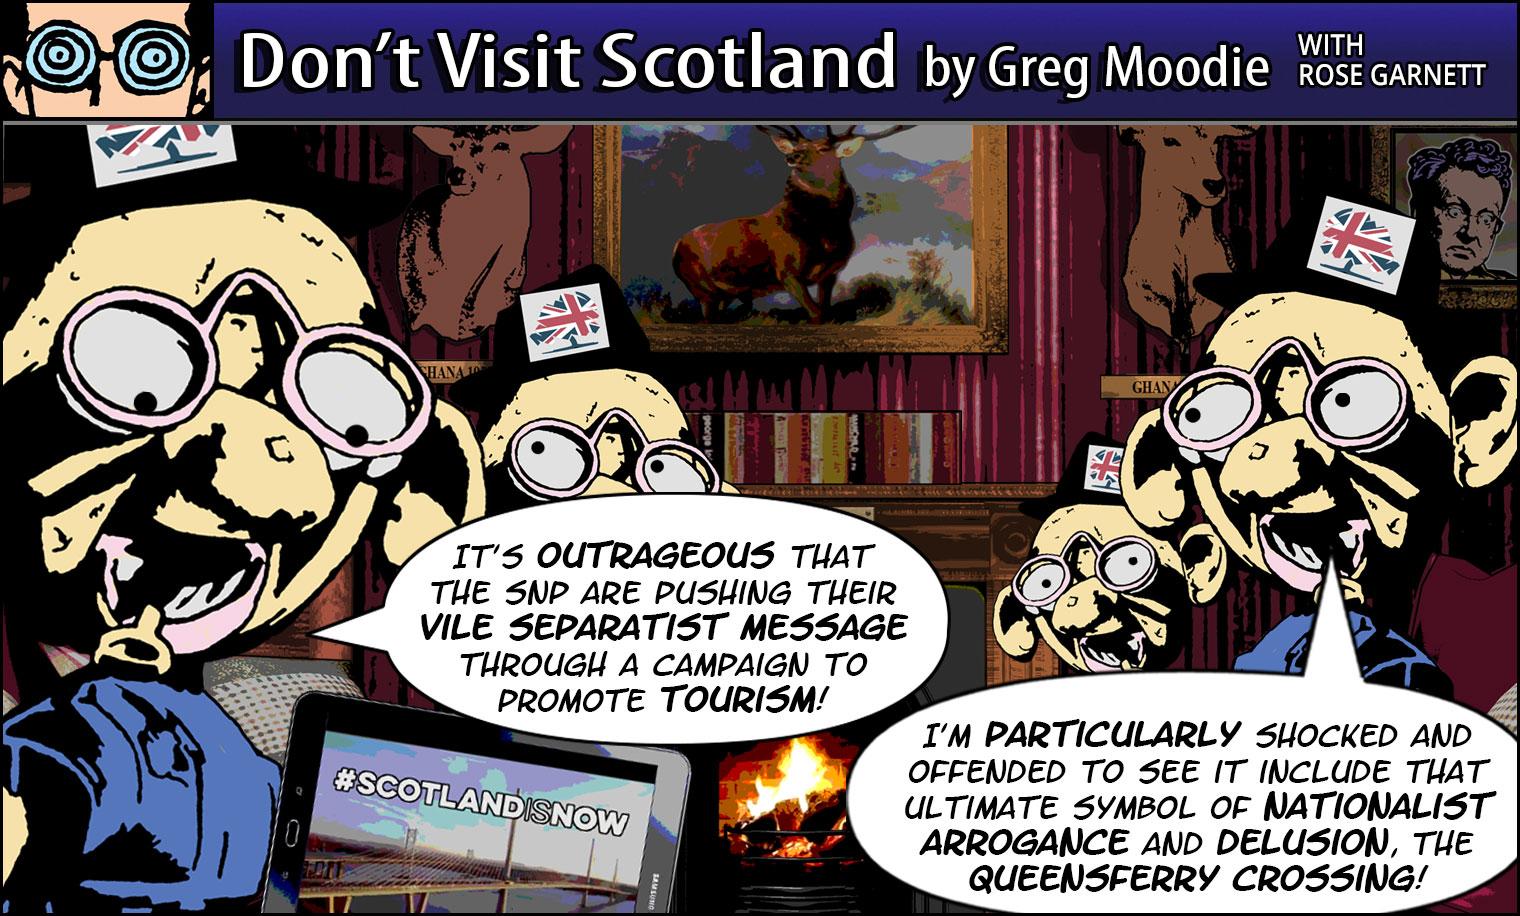 Don't Visit Scotland